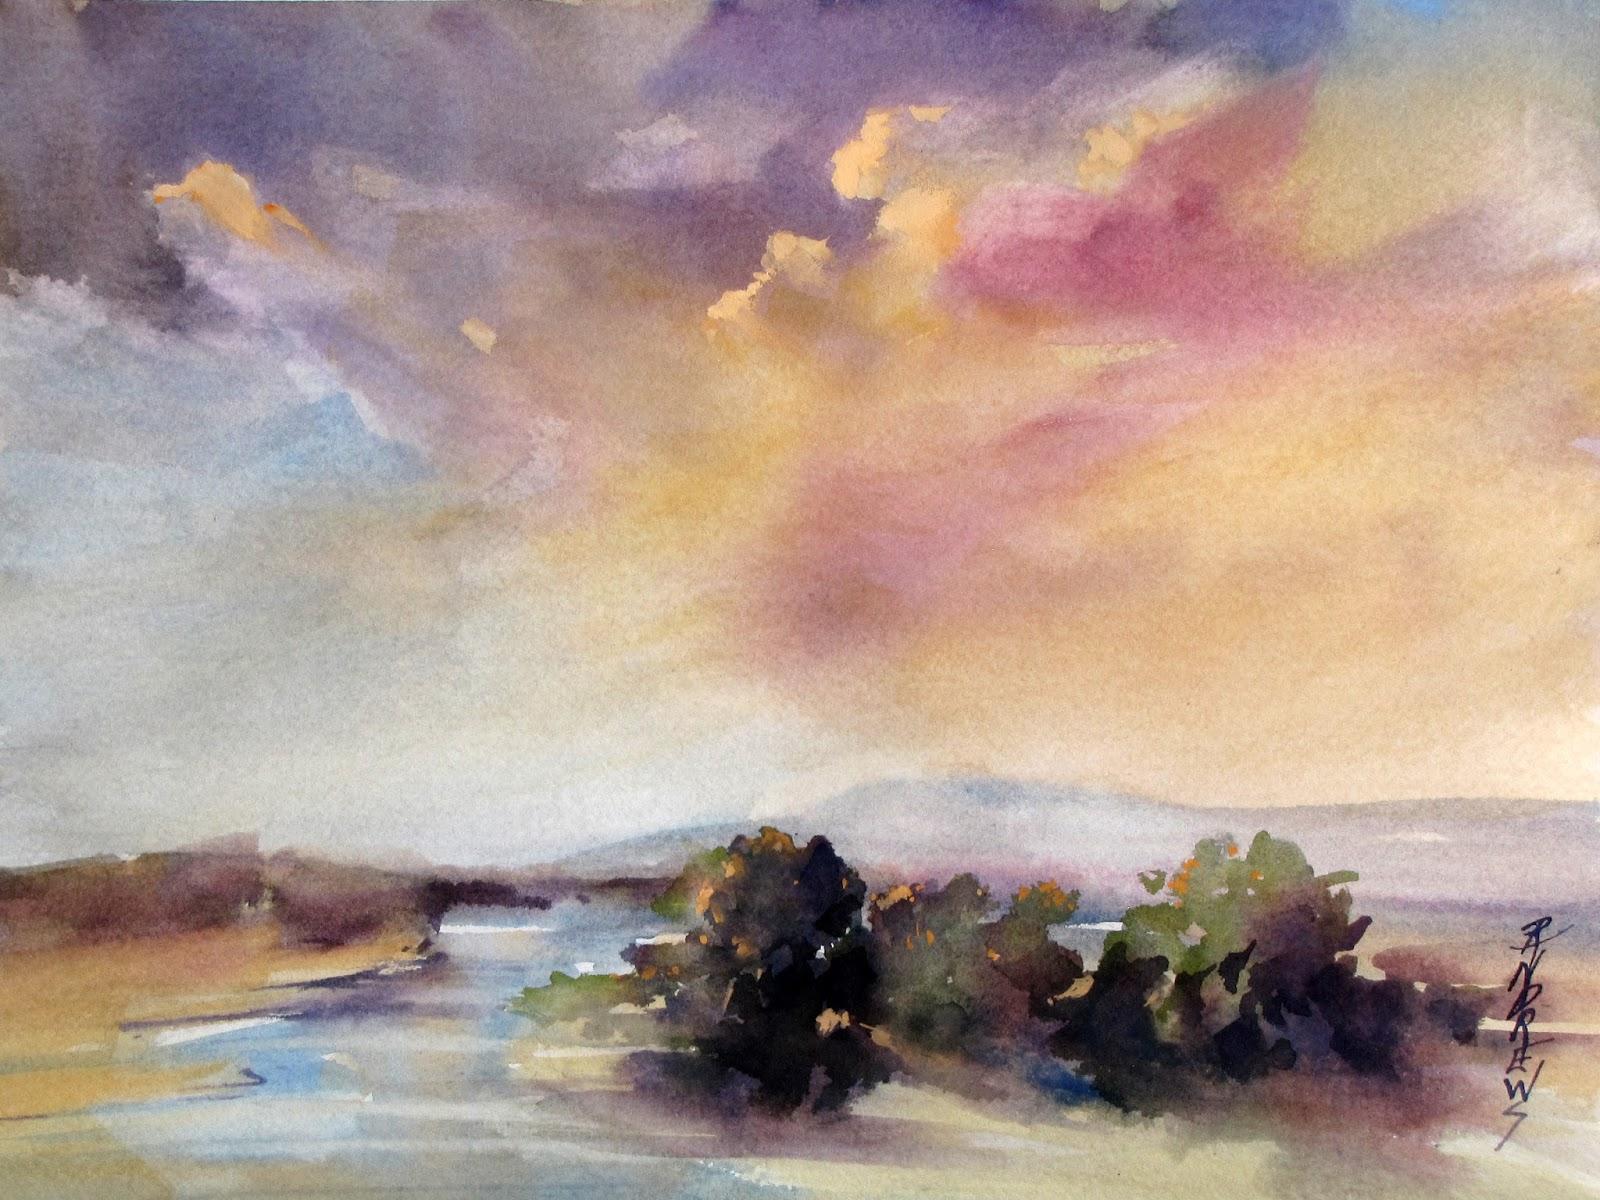 Watercolor artist in texas - Watercolor Texas Artist Rae Andrews